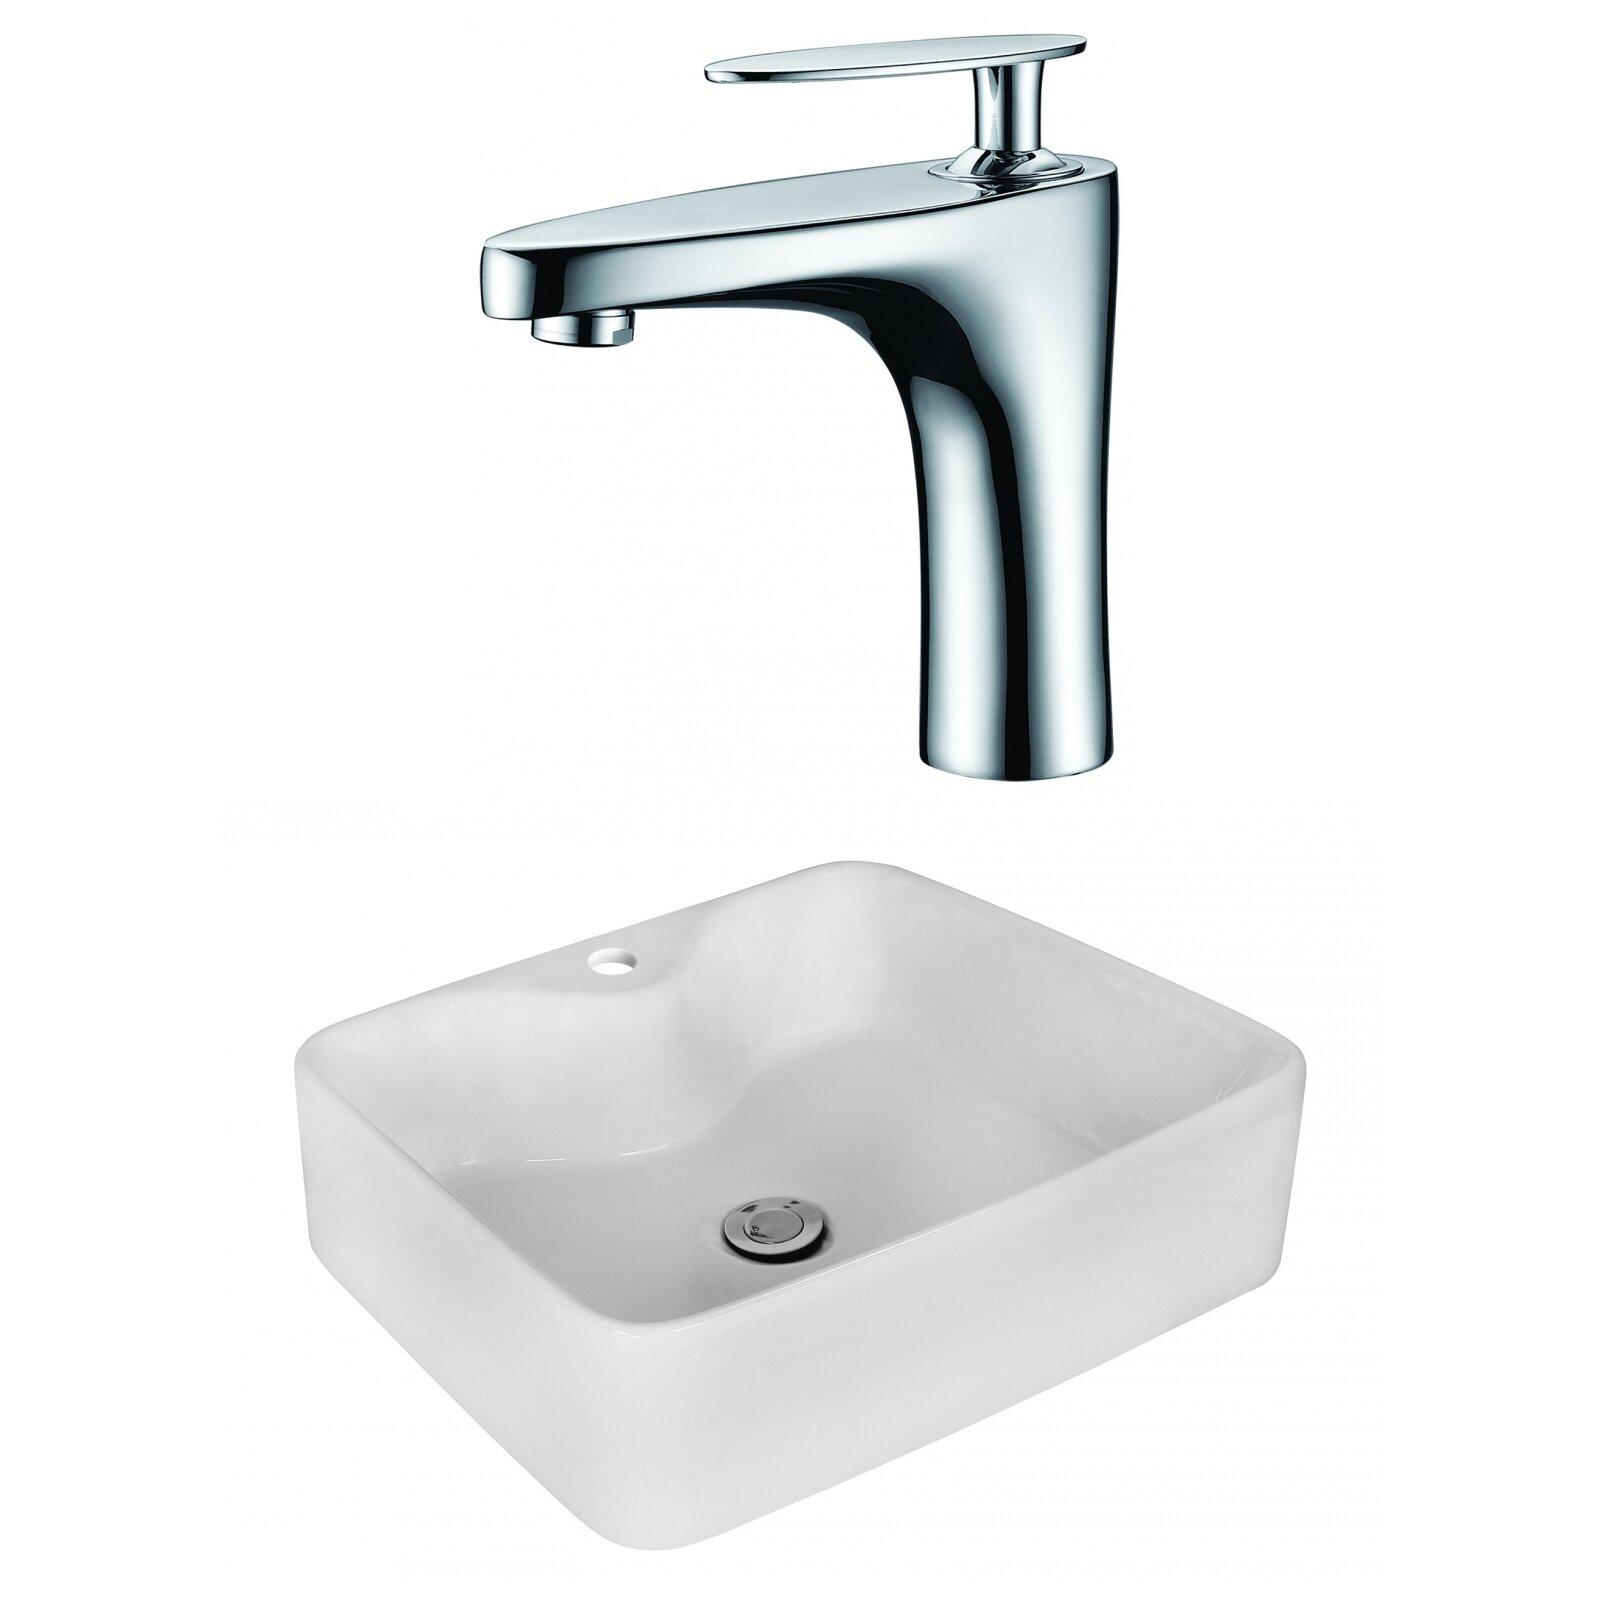 Royalpurplebathkitchen Above Counter Ceramic Rectangular Vessel Bathroom Sink With Faucet Wayfair